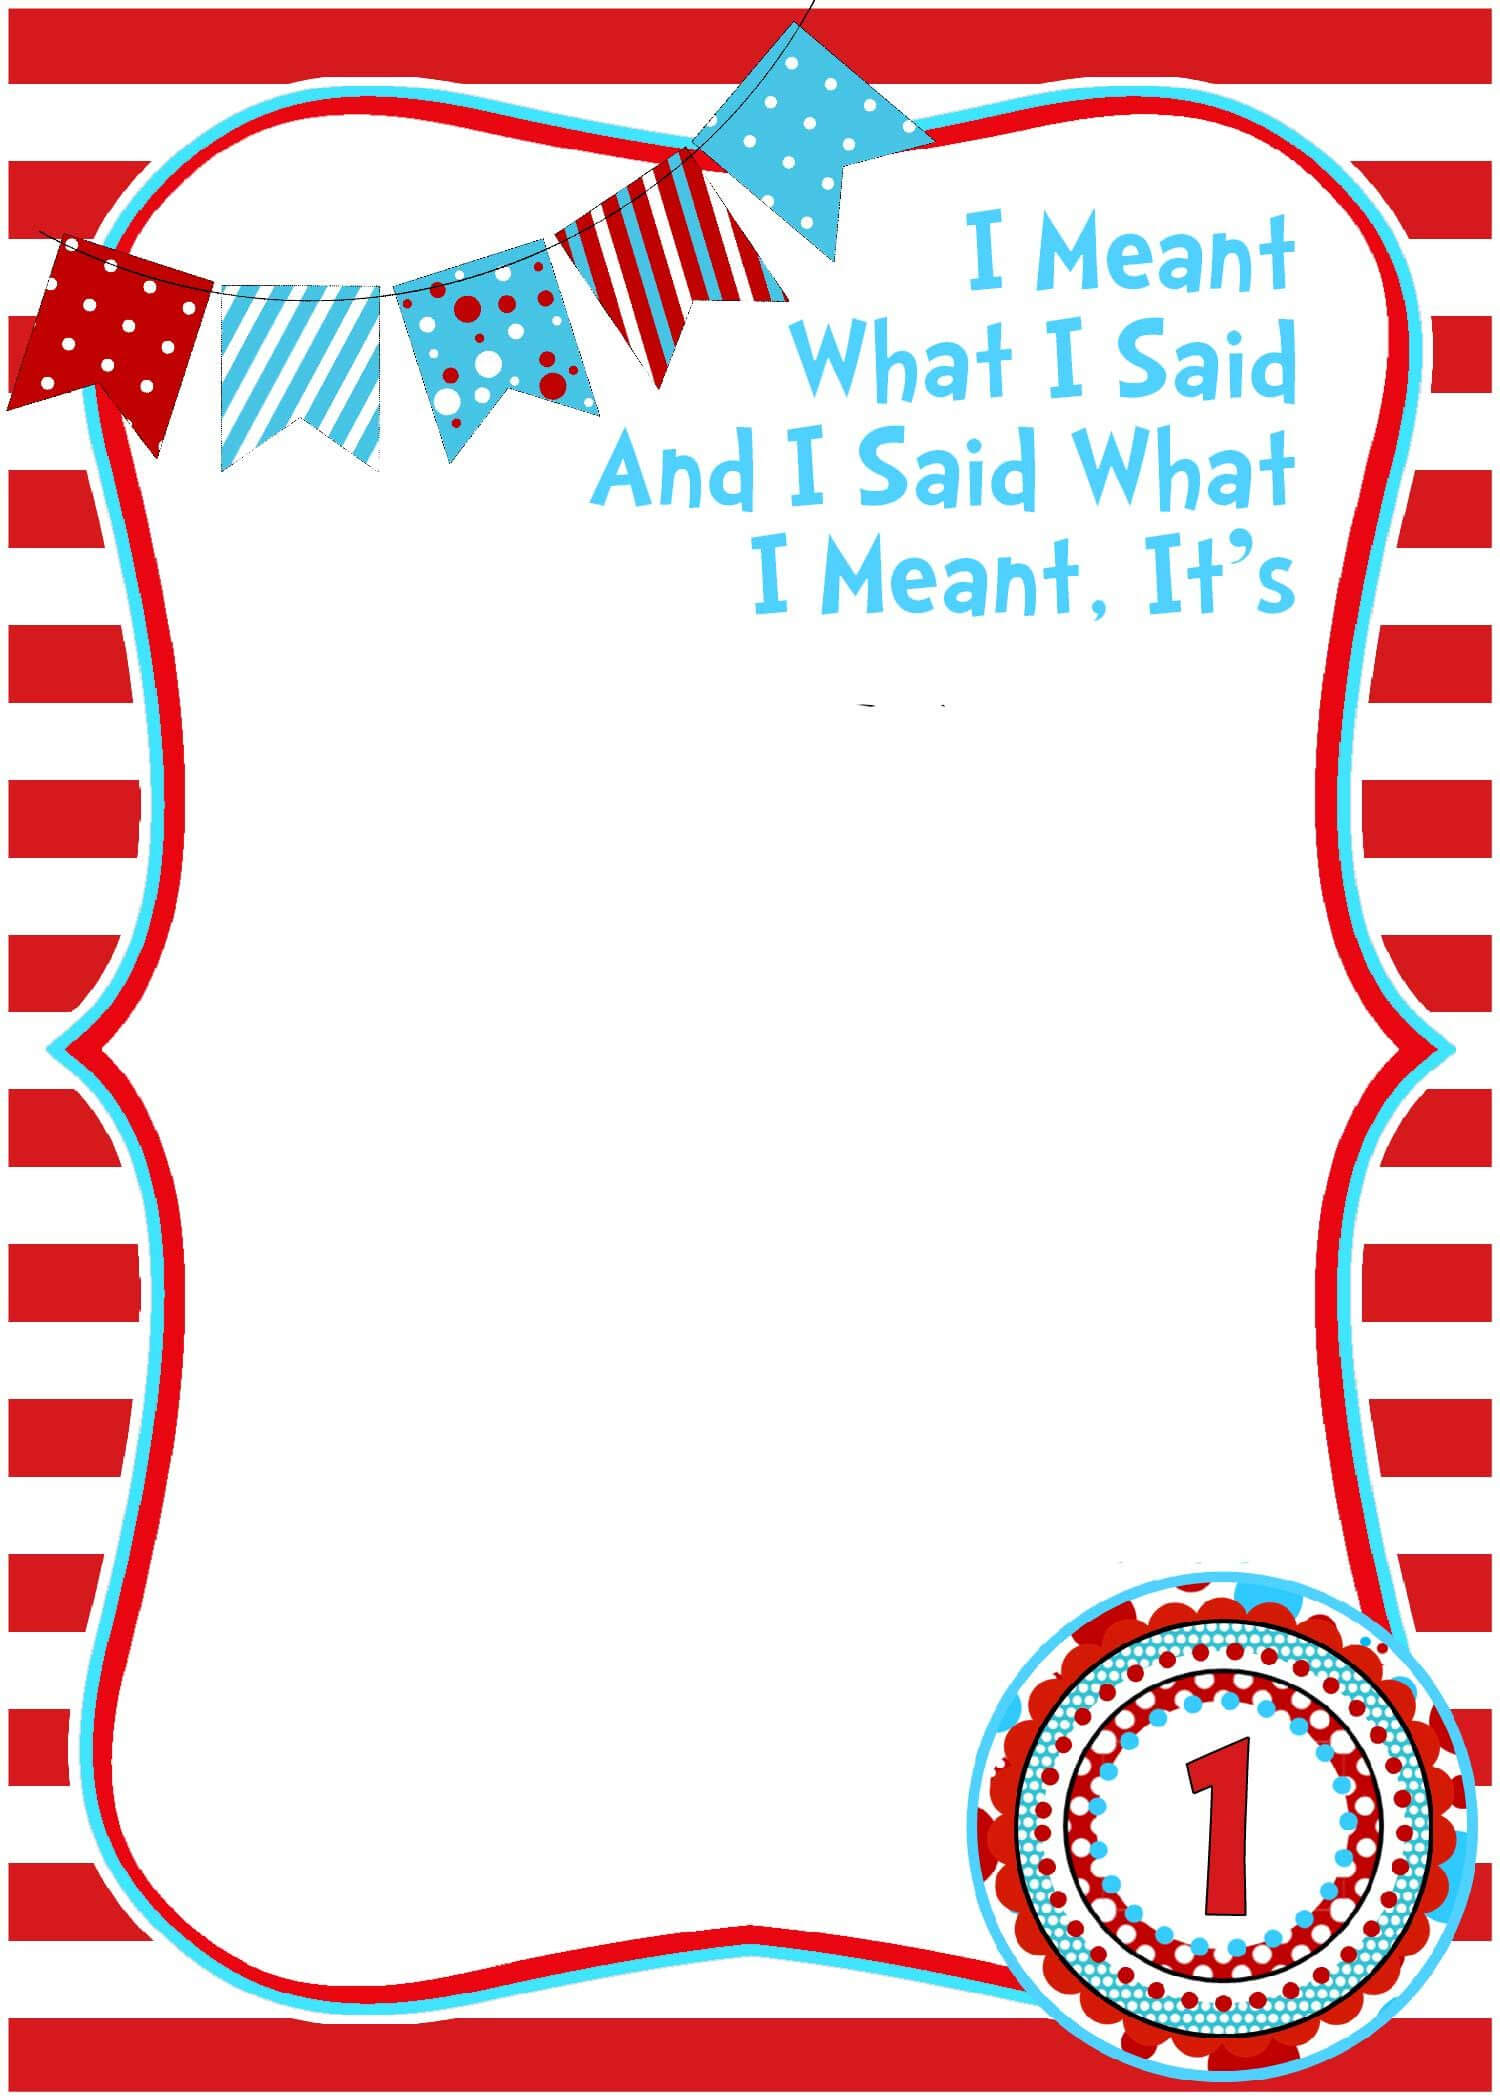 Free Printable Dr Seuss Birthday Invitations   Dr Seuss Intended For Dr Seuss Birthday Card Template